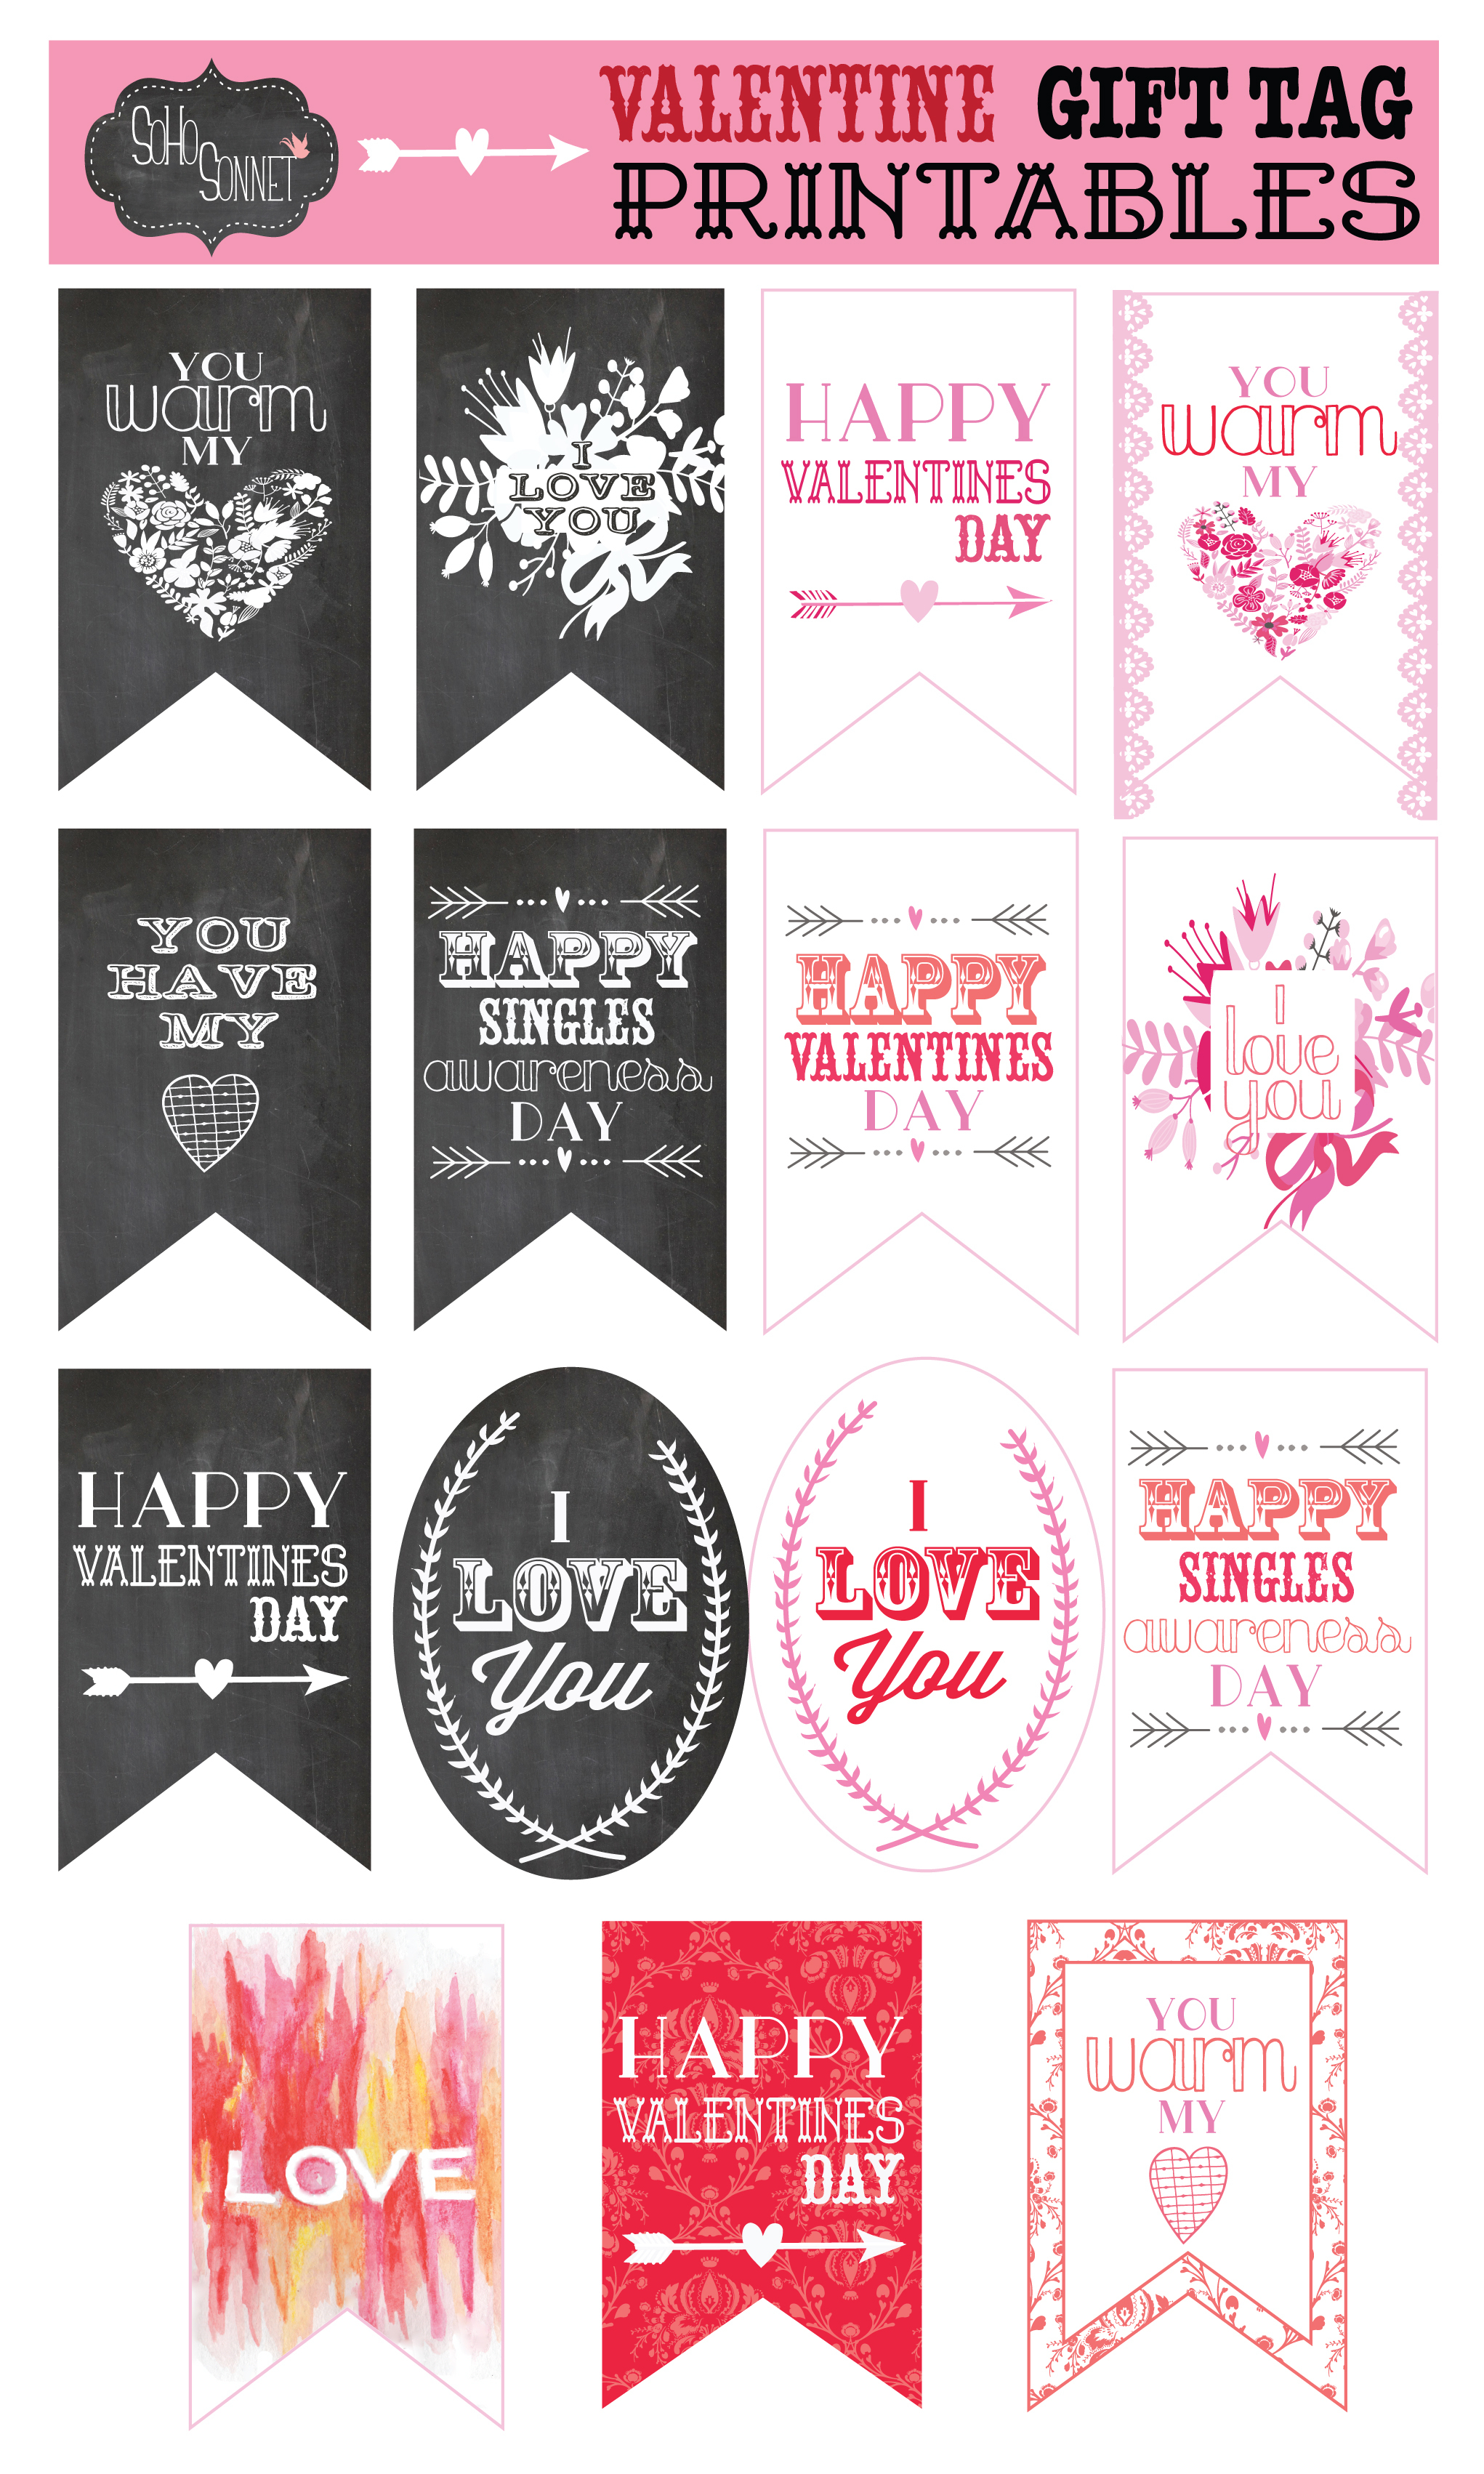 Free Valentine Gift Tag Printables - Sohosonnet Creative Living - Free Printable Valentines Day Tags